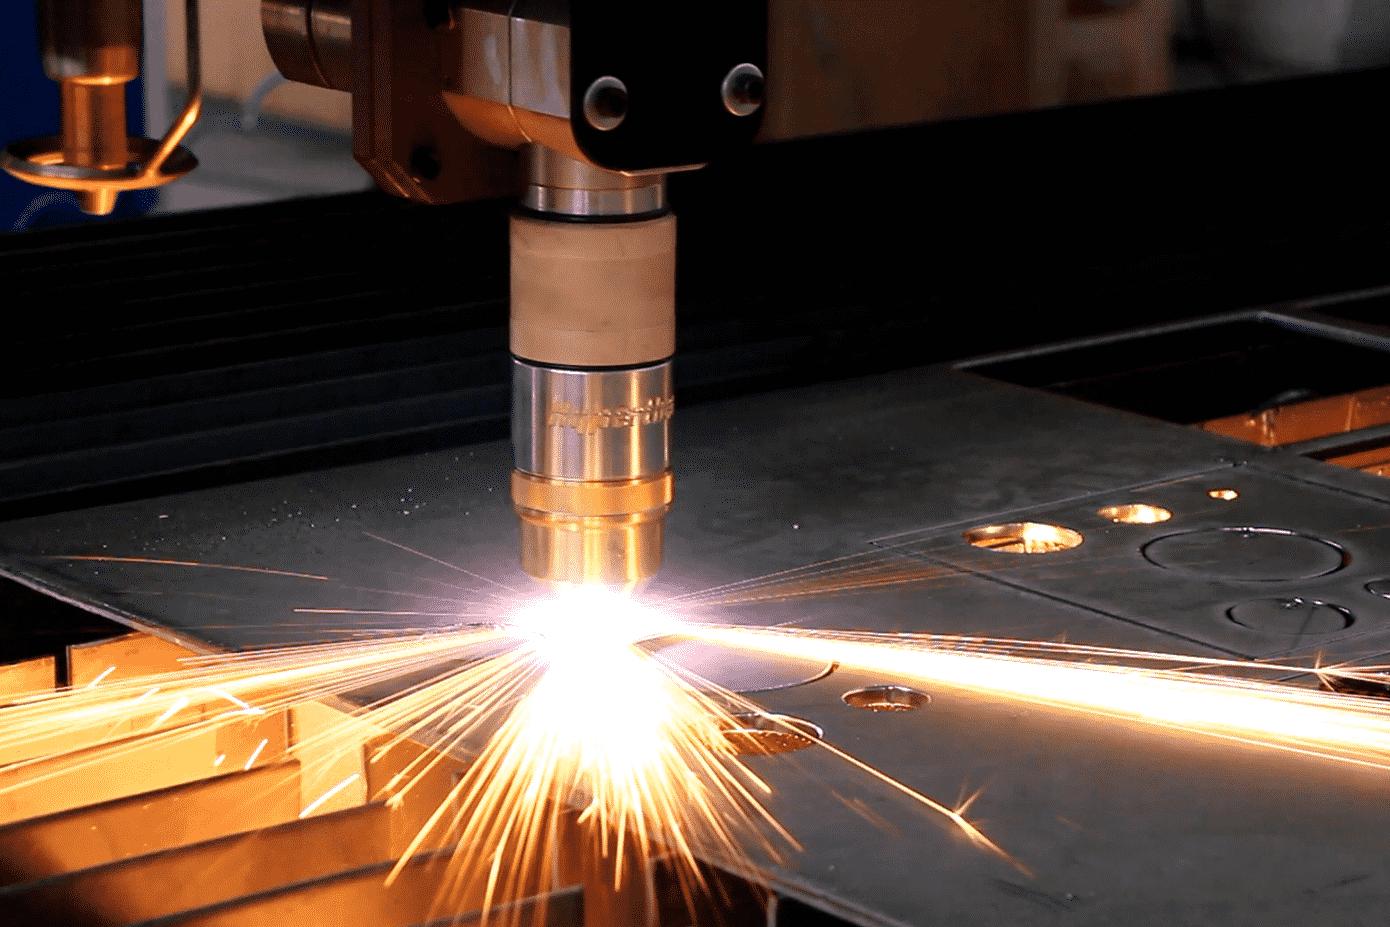 Morgan-Rushworth-ACP-CNC-Compact-Plasma-Cutting-Torch-in-Action-Detail